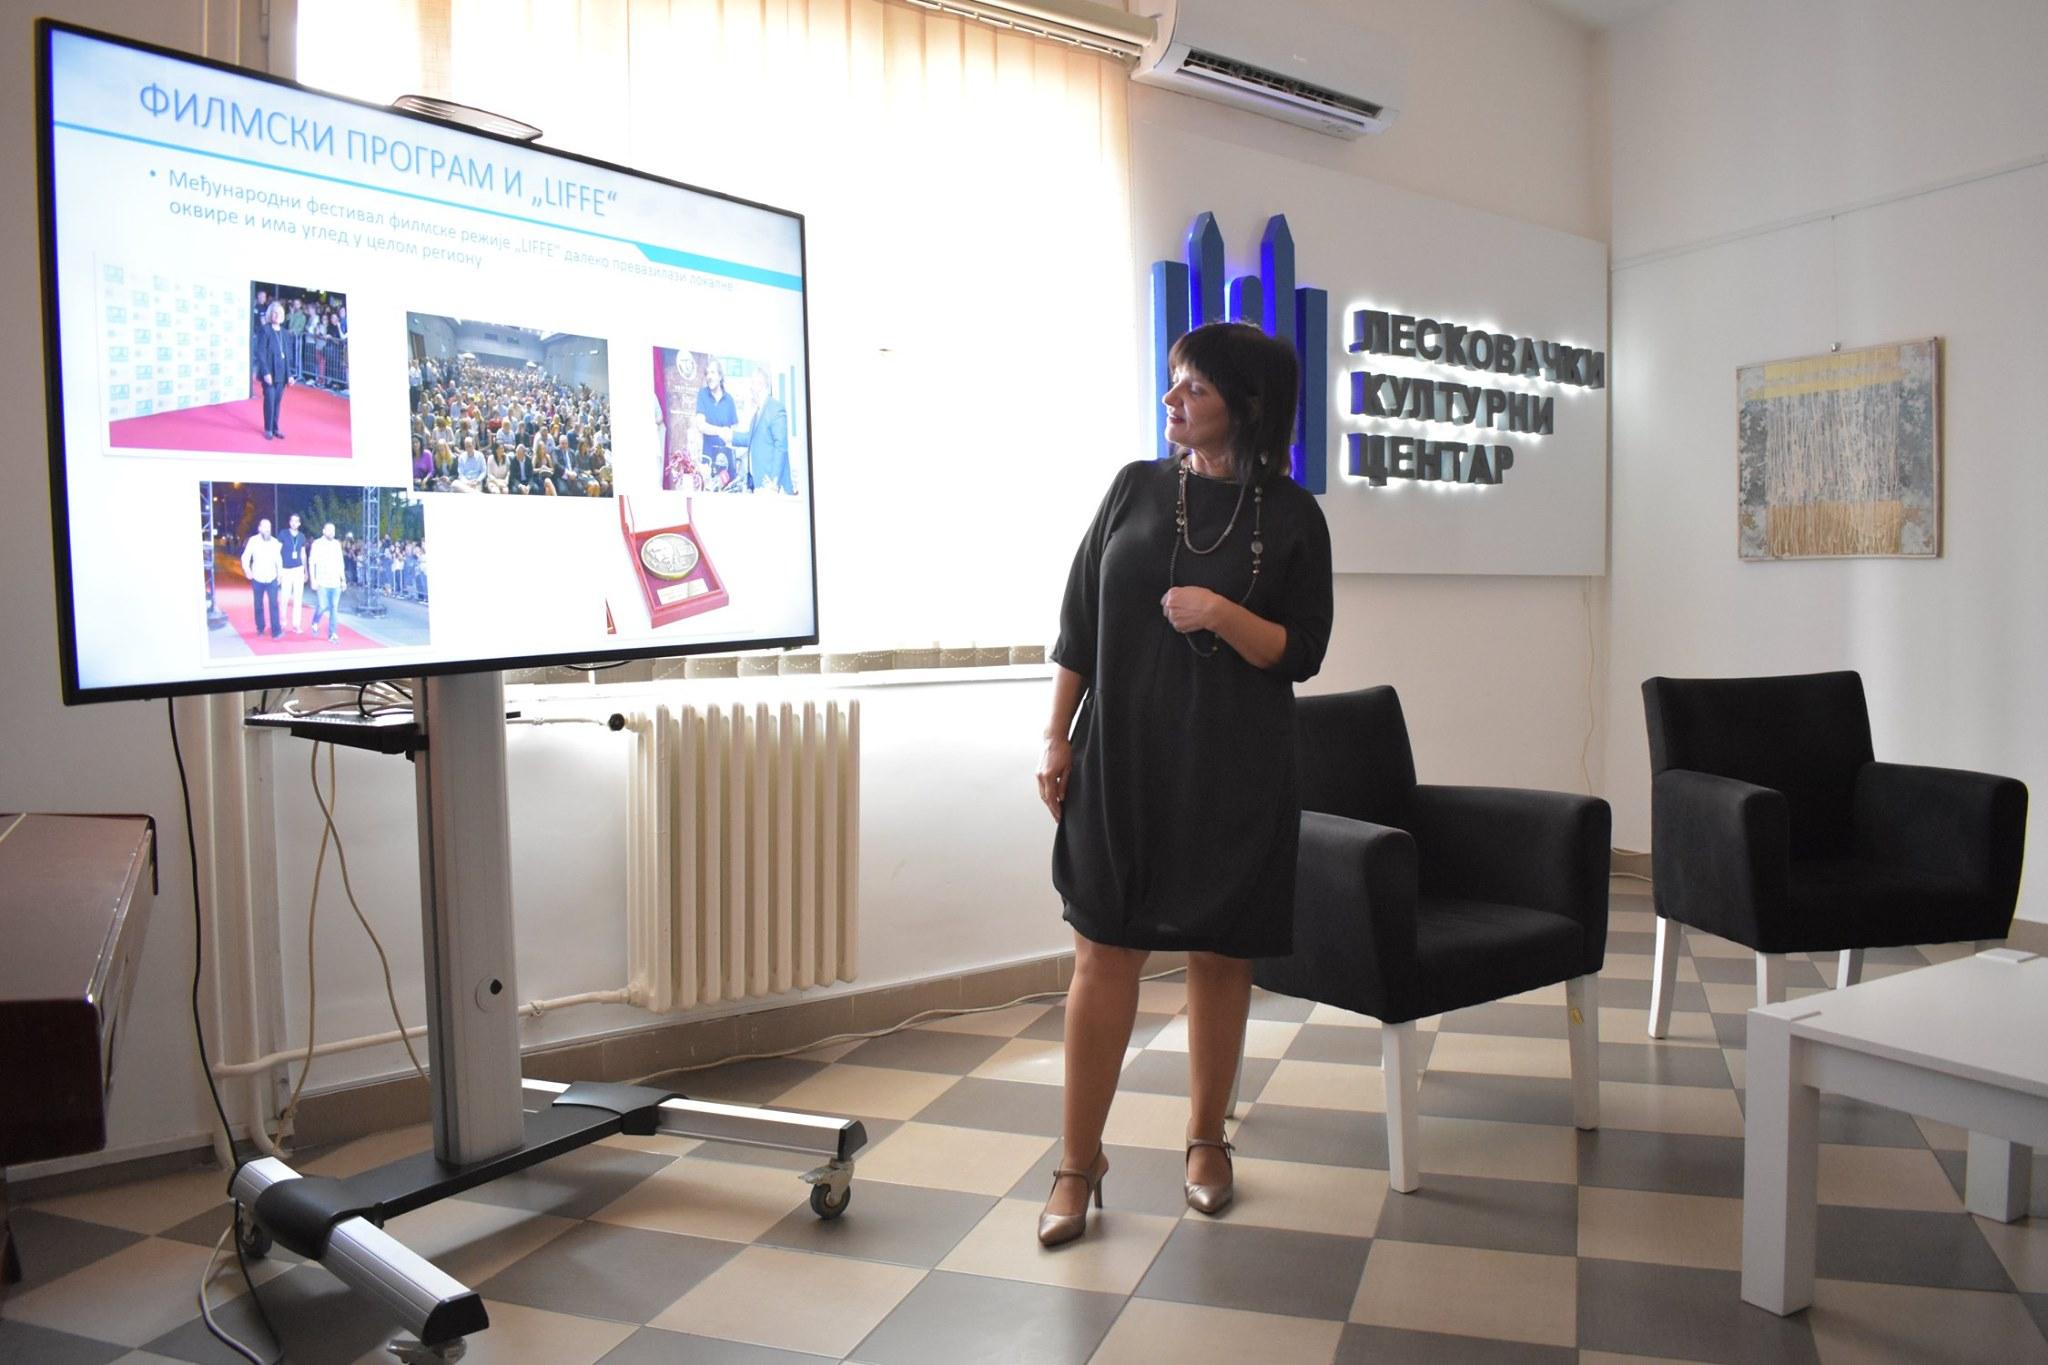 prezentacija-lkc-ministar-kulture